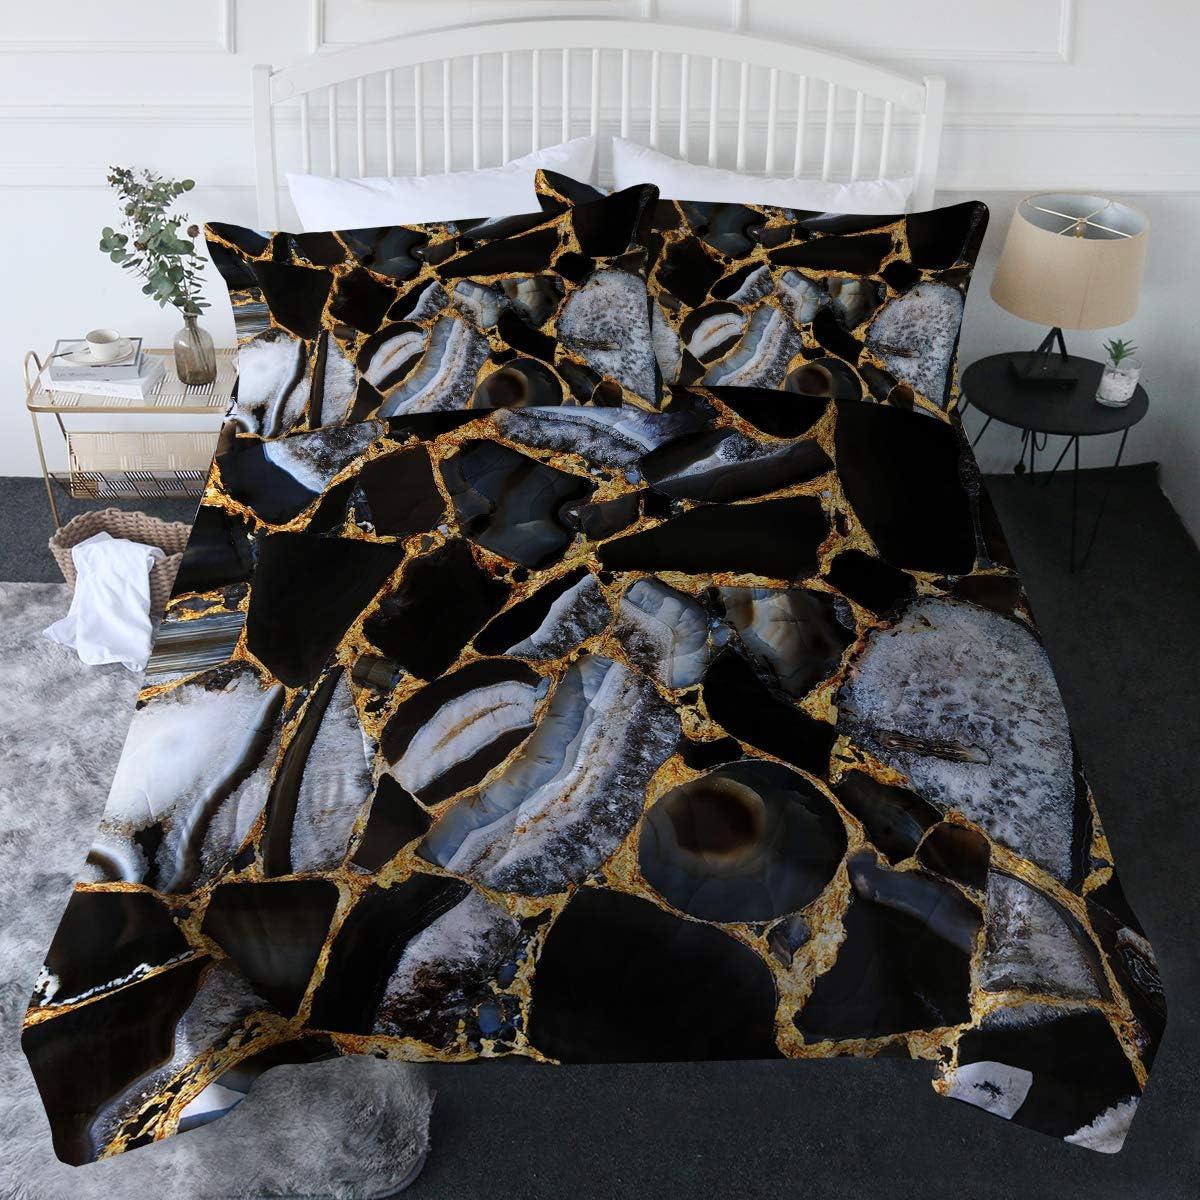 Brand Cheap Sale Venue Blessliving 3 Piece Marble Comforter Las Vegas Mall Set Shams with Blu Pillow –